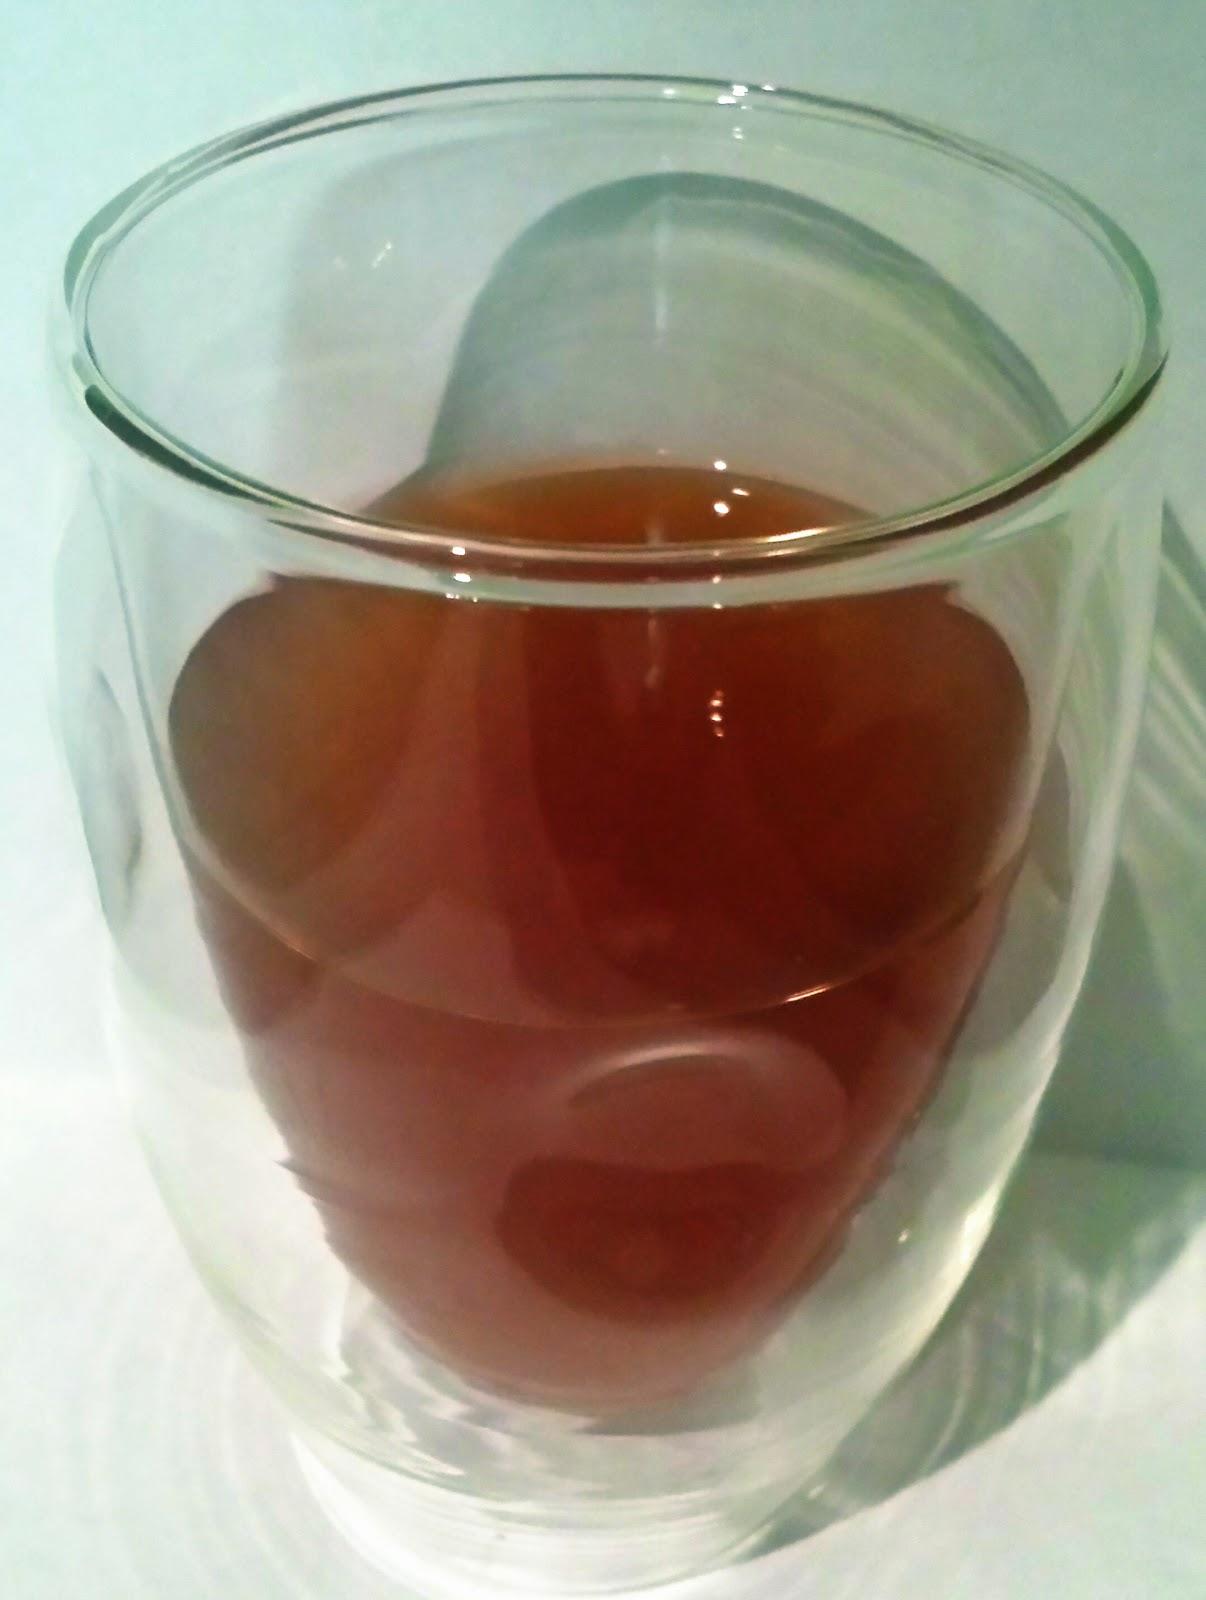 The Persimmon Tree Tea Company Peach Picnic and Banana Coconut Review via ProductReviewMom.com